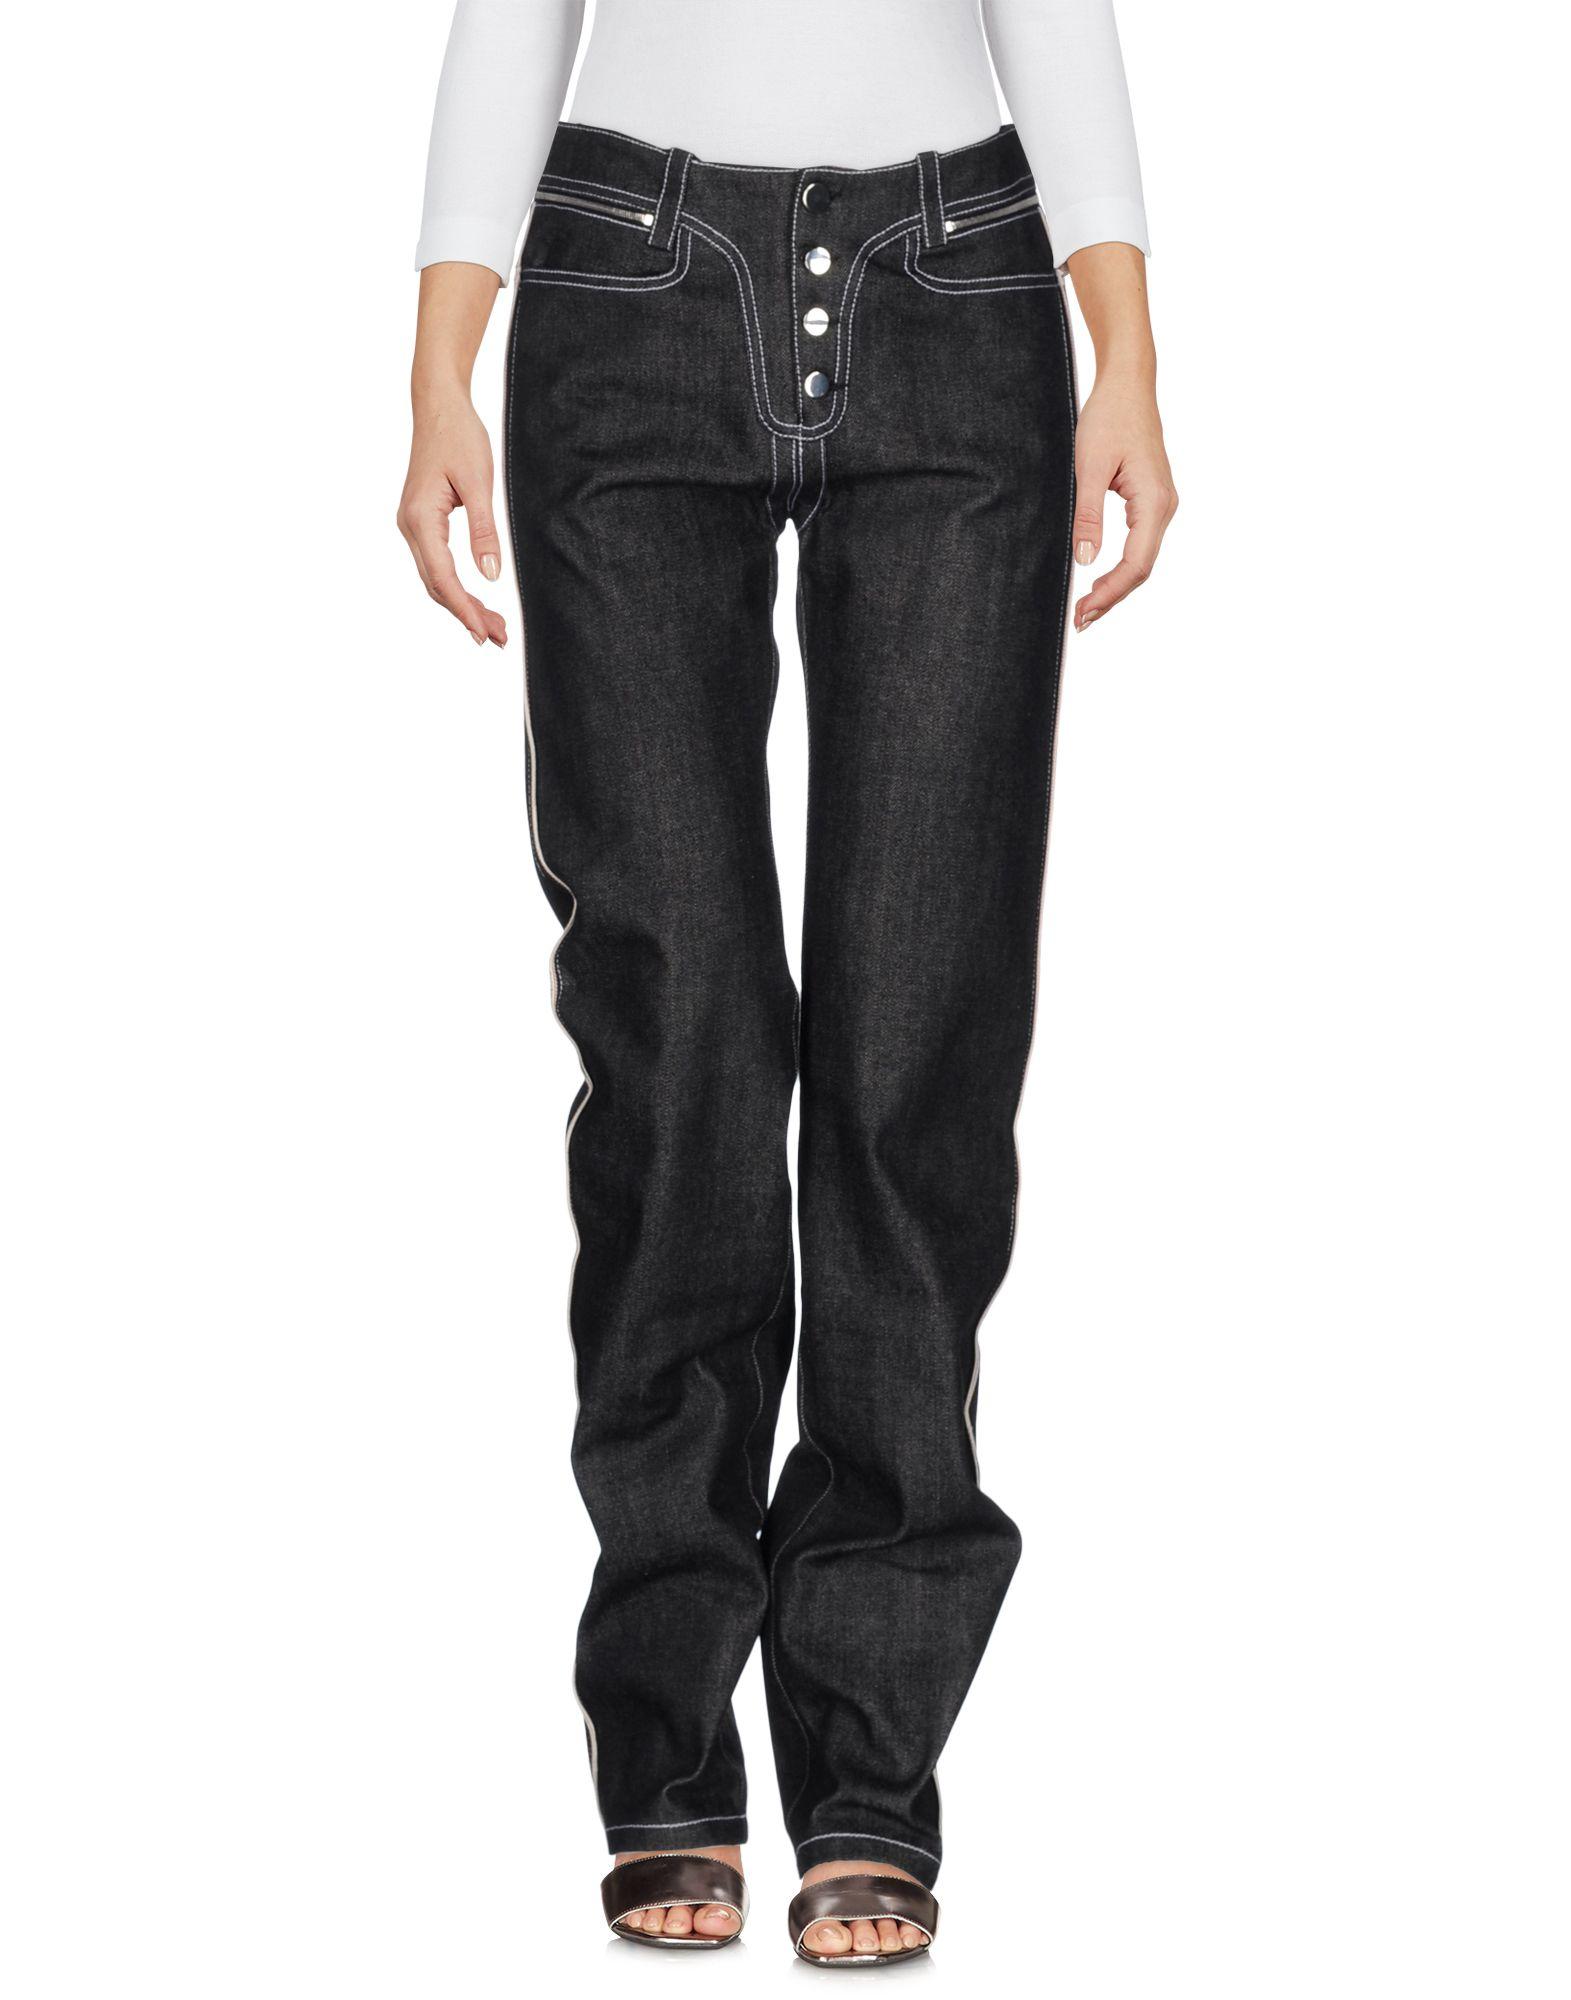 Pantaloni Jeans Paco Rabanne Donna - Acquista online su Au8jBov7